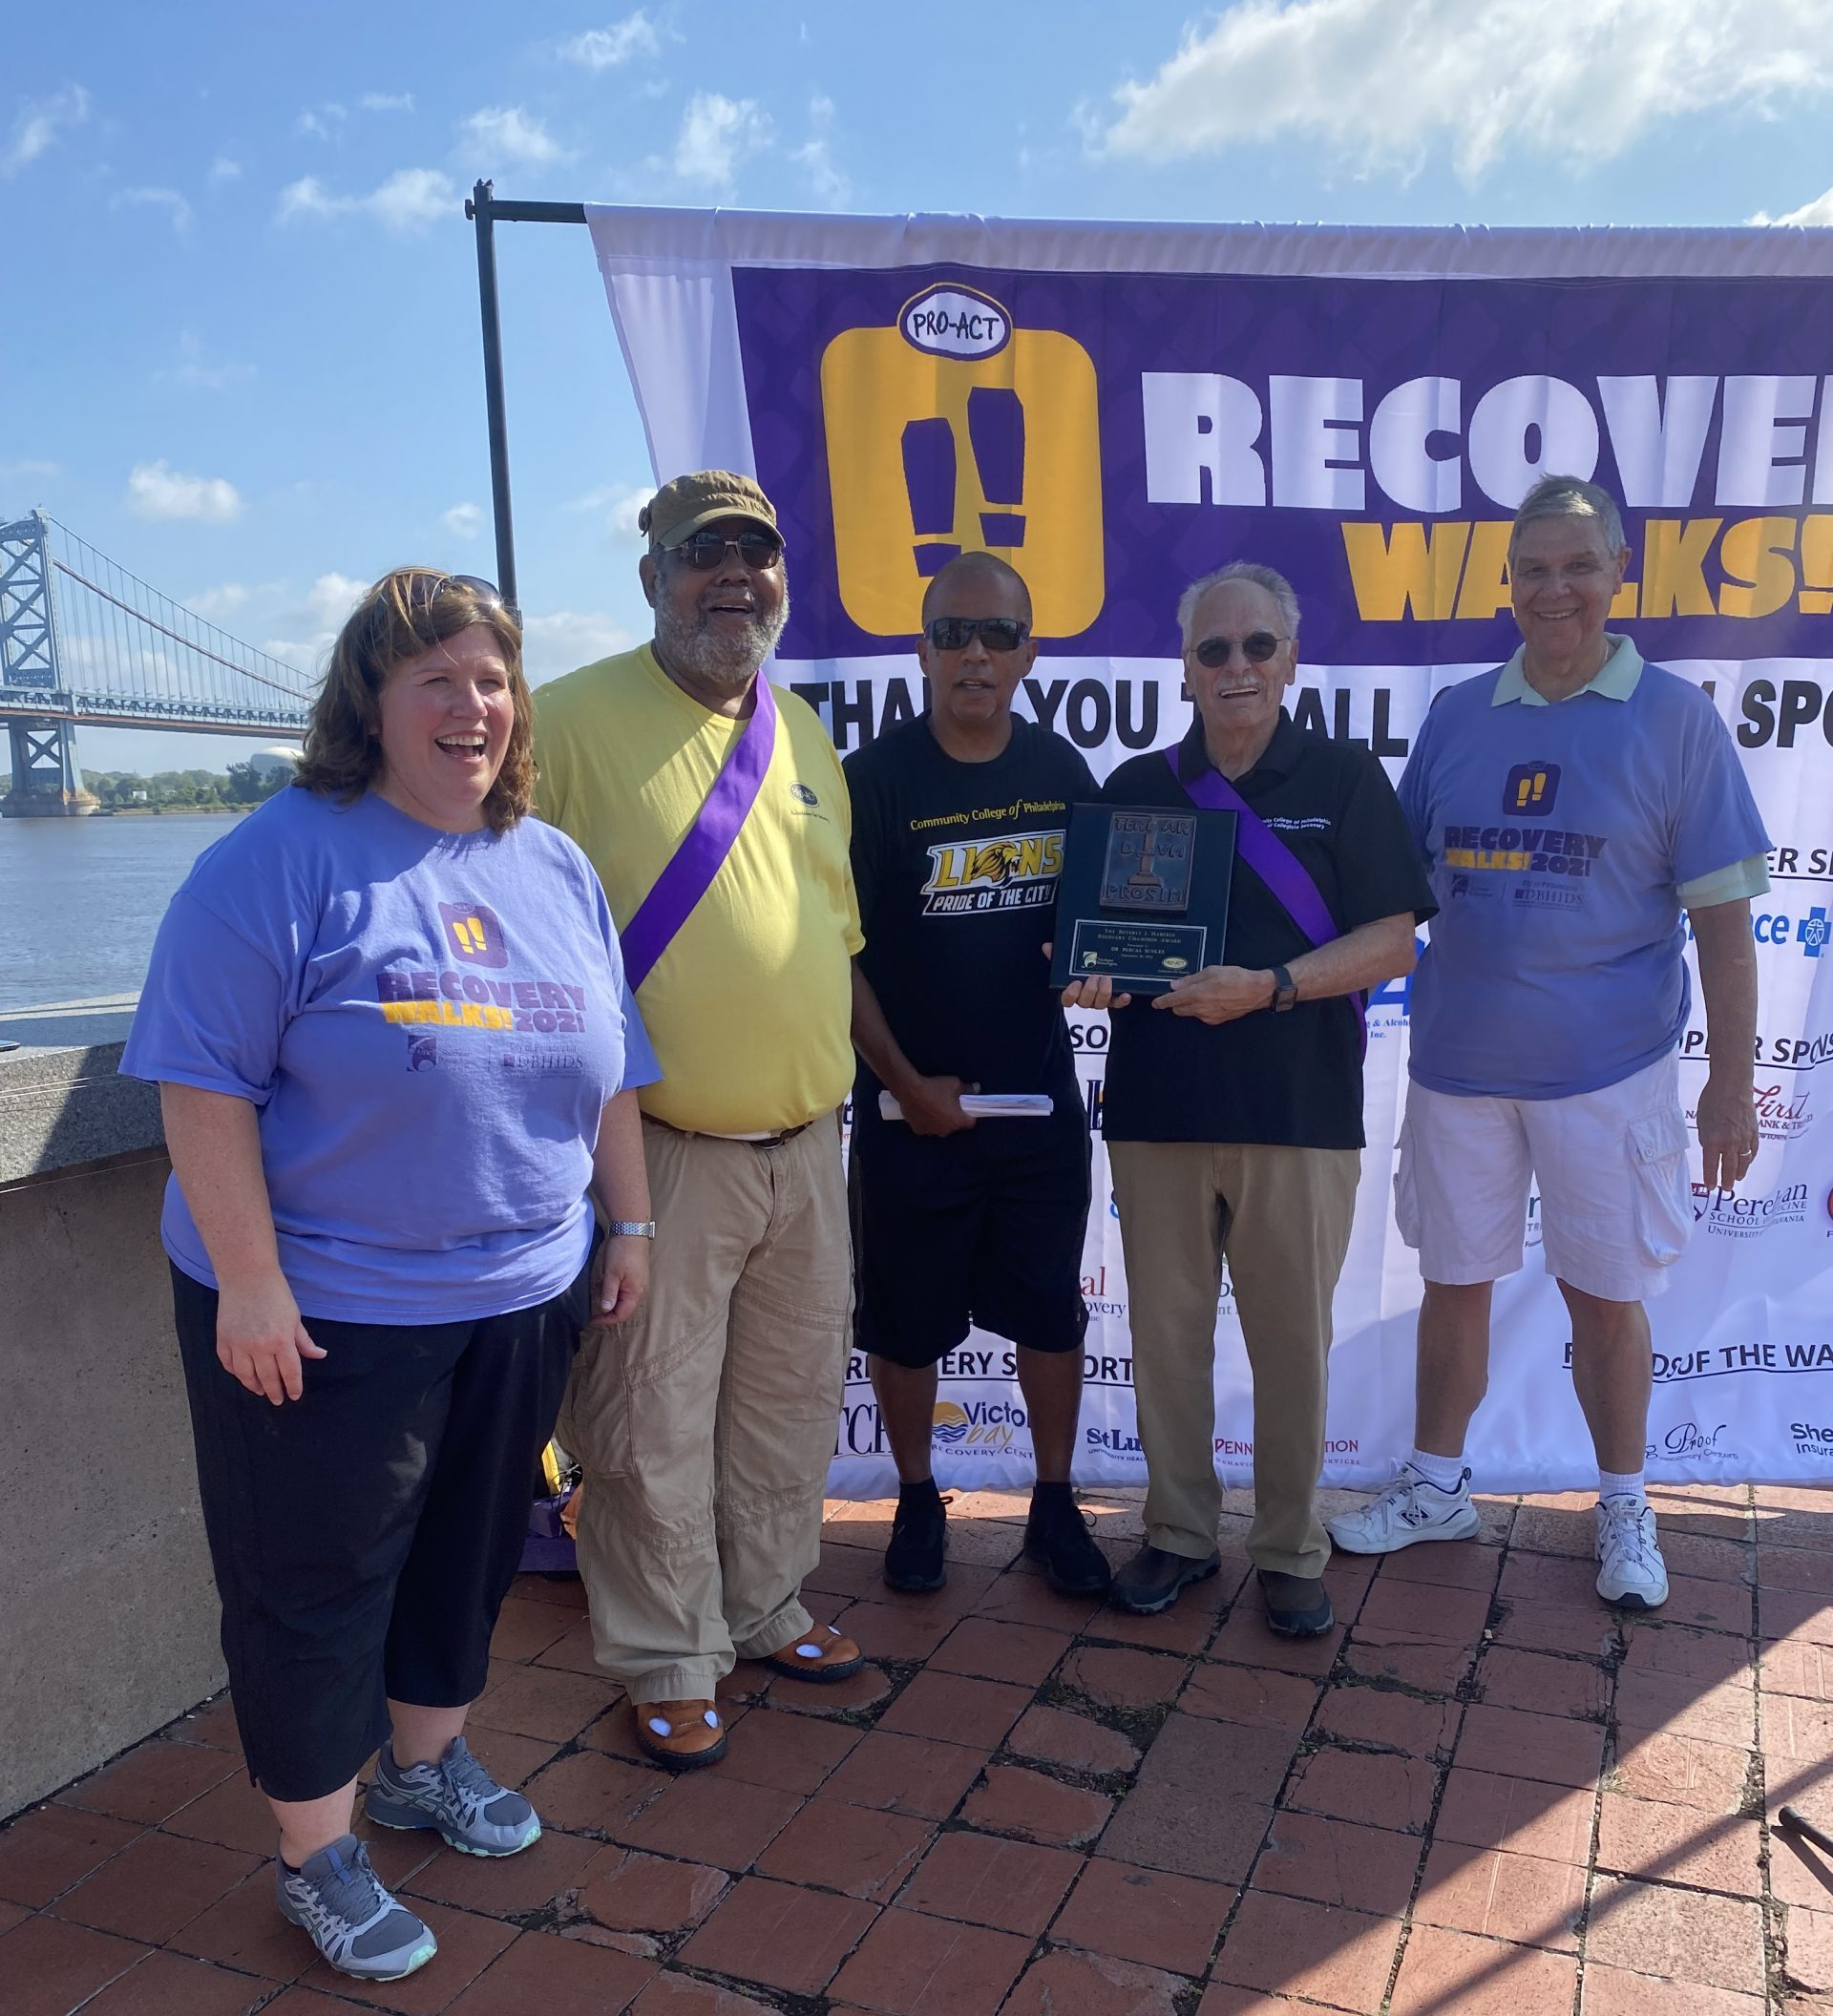 Recovery Walks 2021 Philadelphia